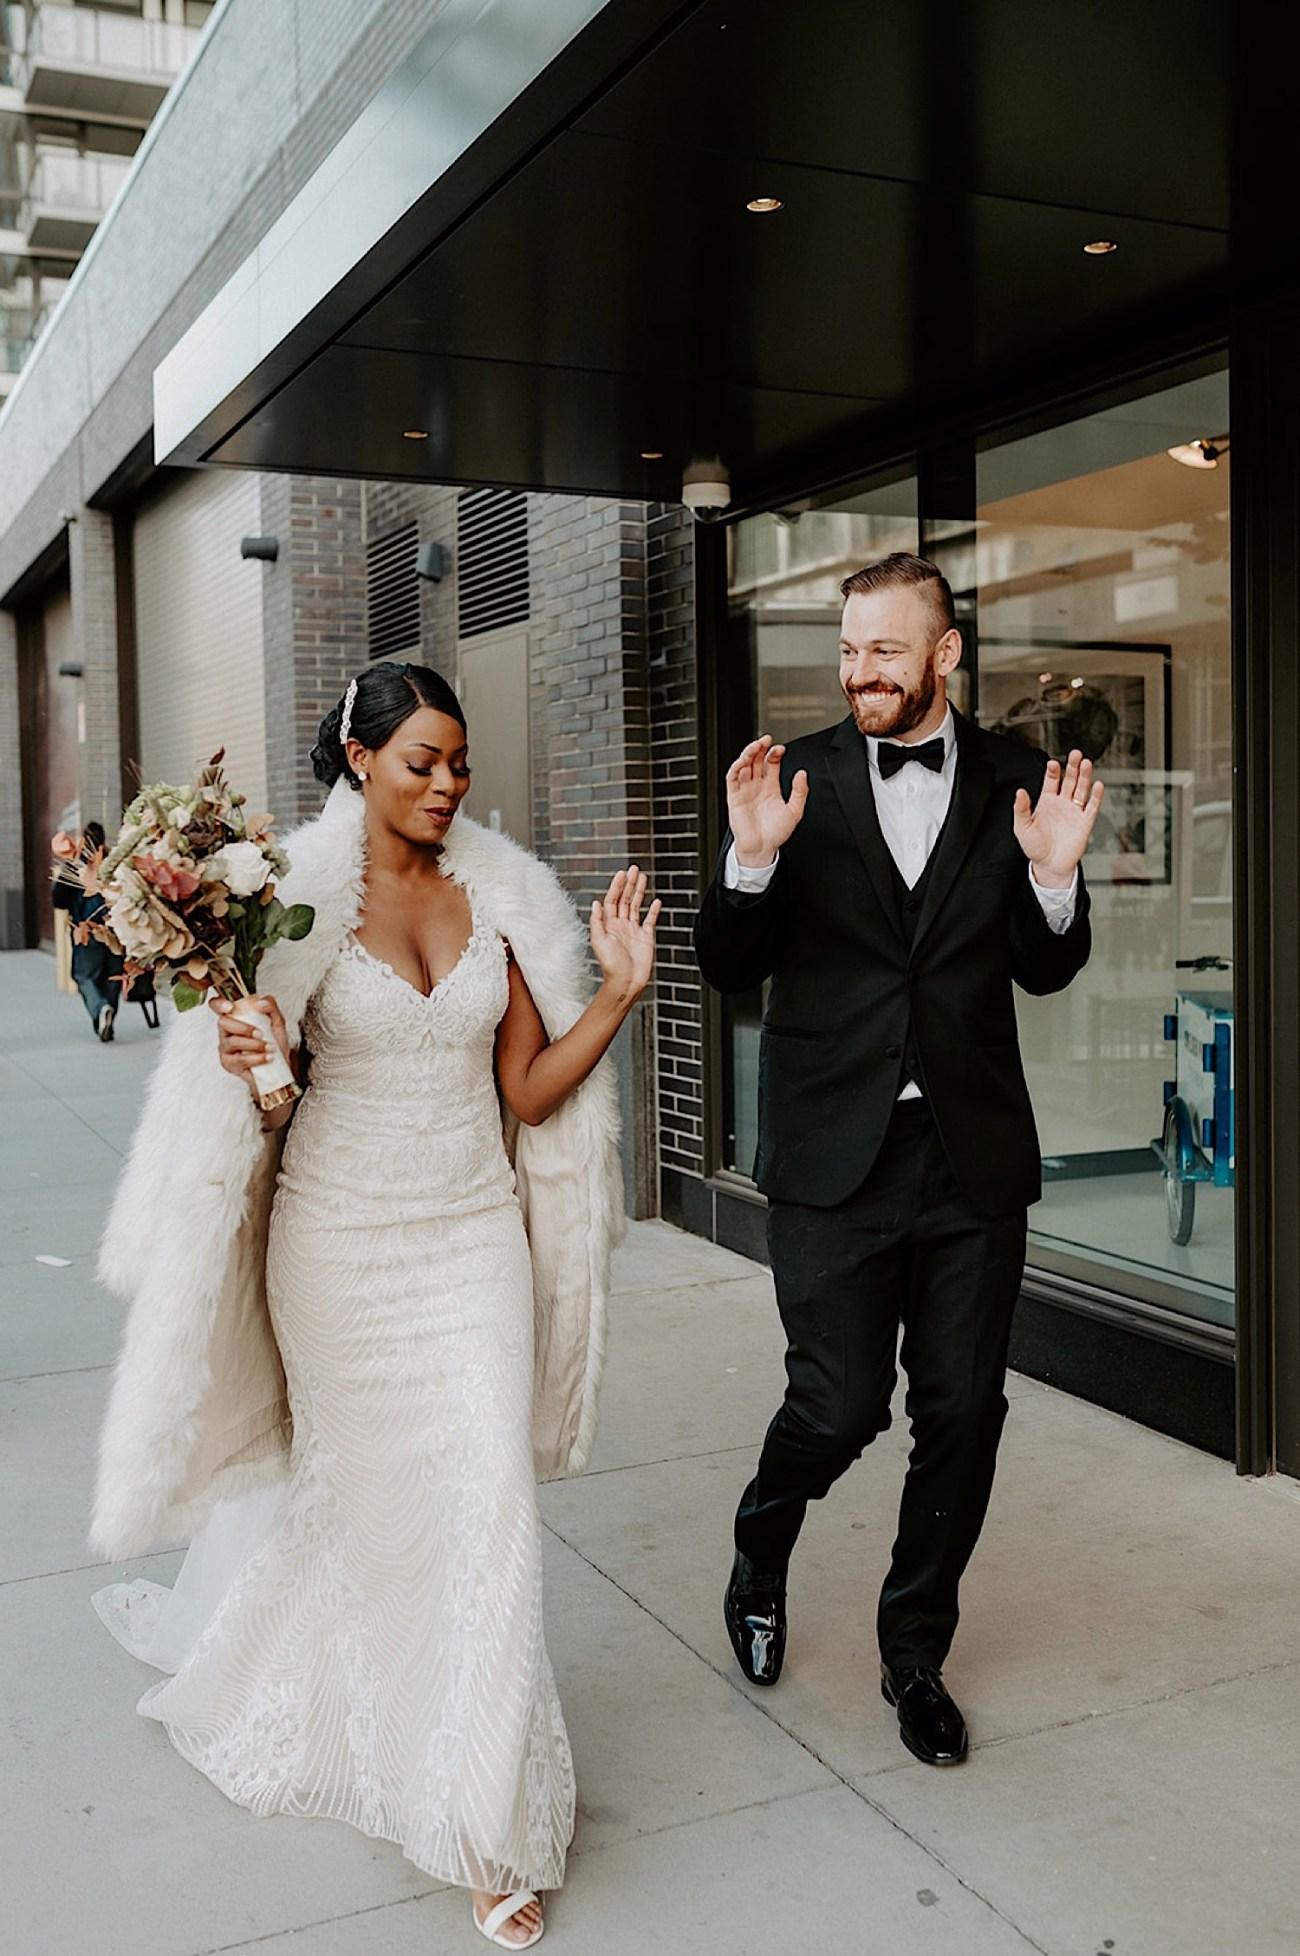 153 Rooklyn Dumbo Elopement Brooklyn Wedding Photographer NYC Wedding Destination Elopement